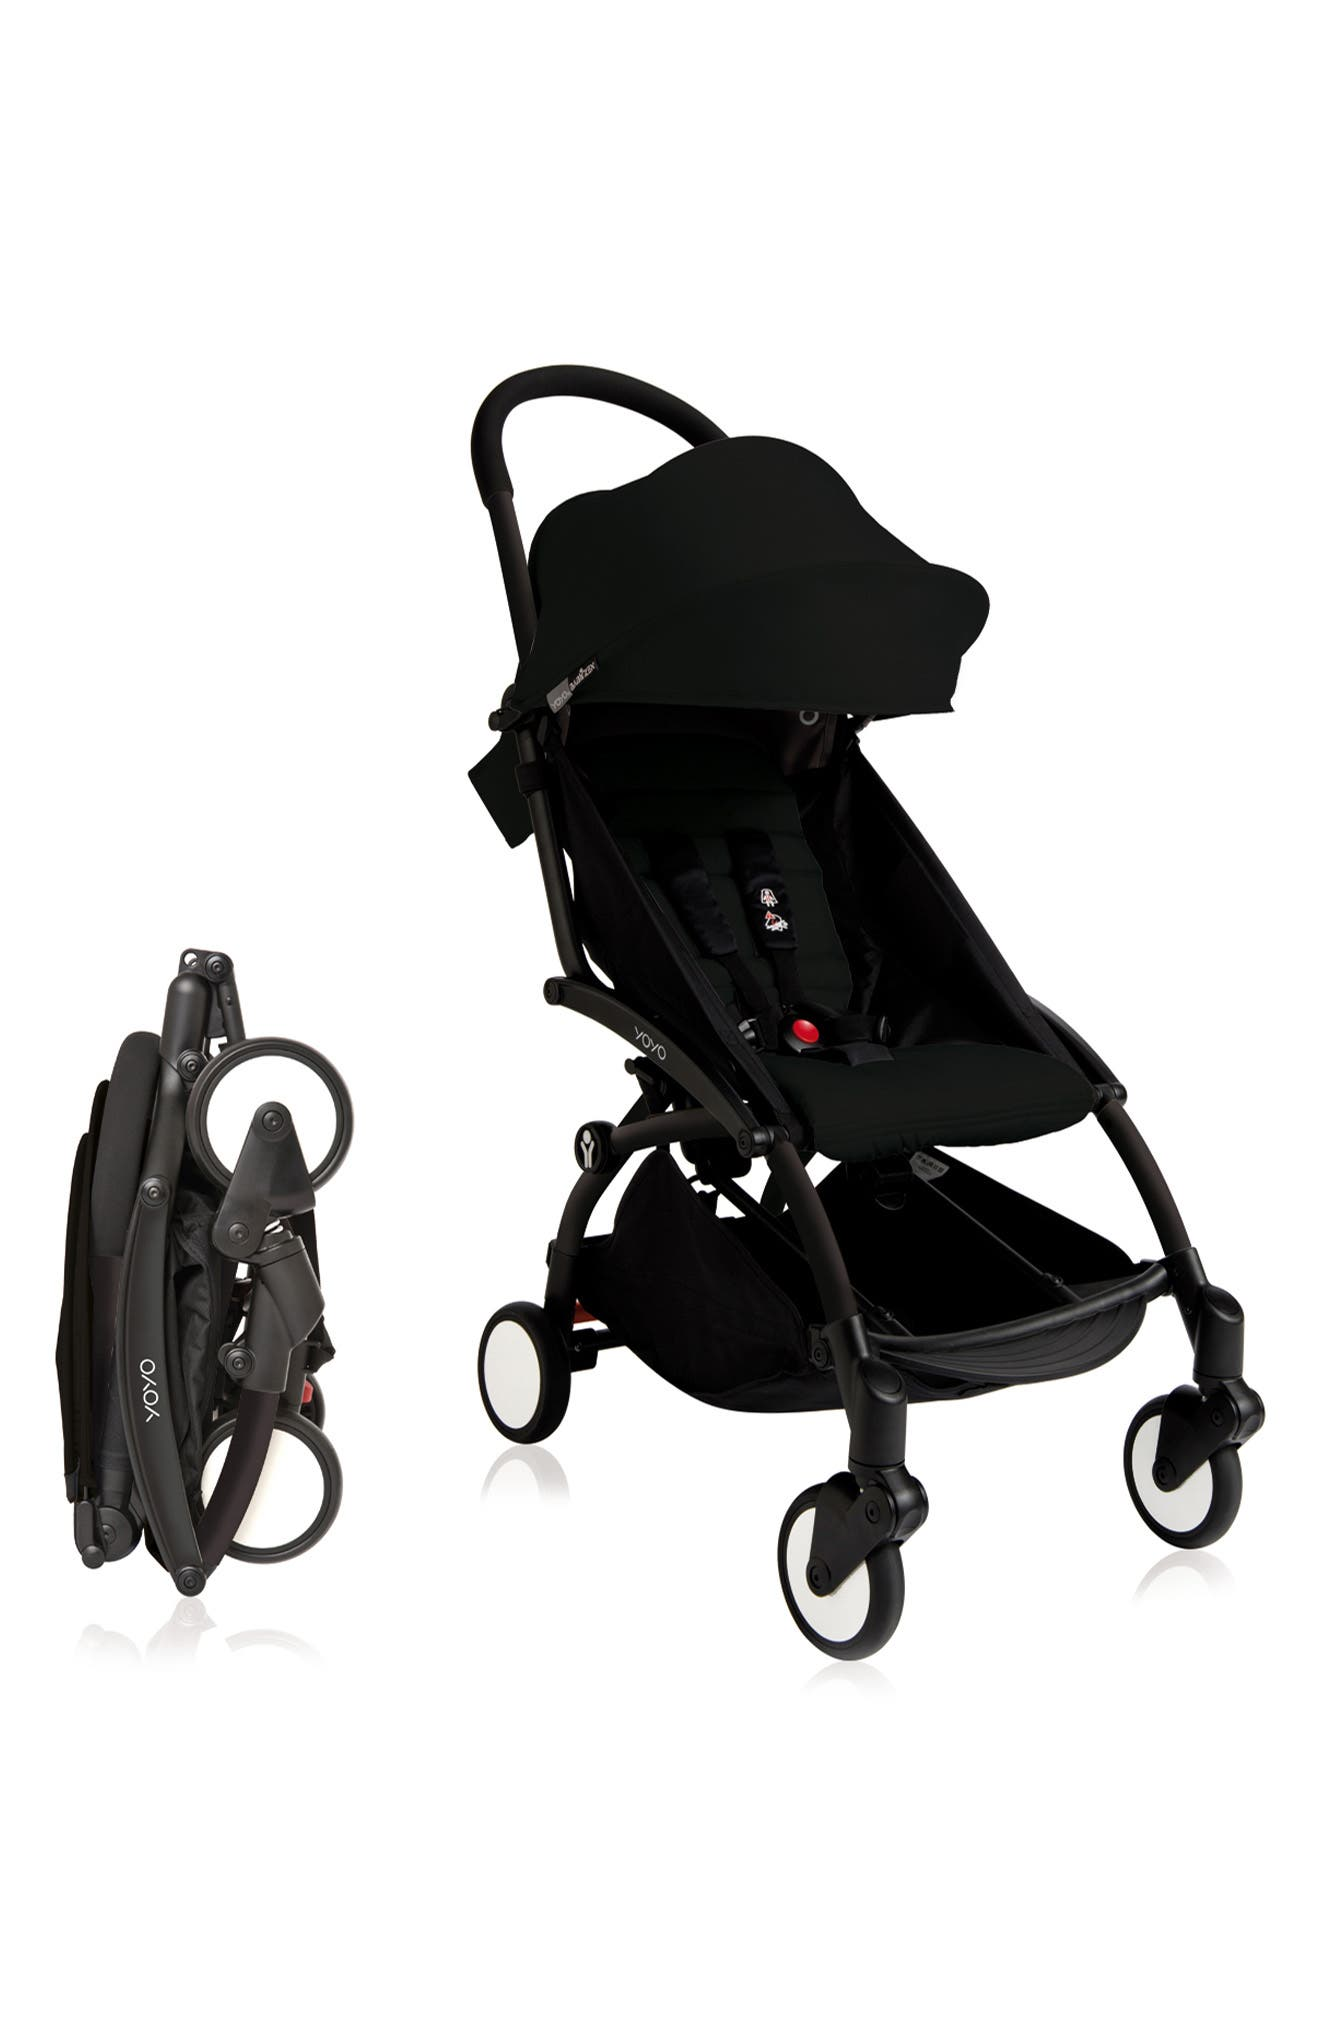 BABYZEN YOYO+ Complete Stroller with Toddler/Little Kid Color Pack Fabric Set,                             Alternate thumbnail 3, color,                             BLACK/ BLACK